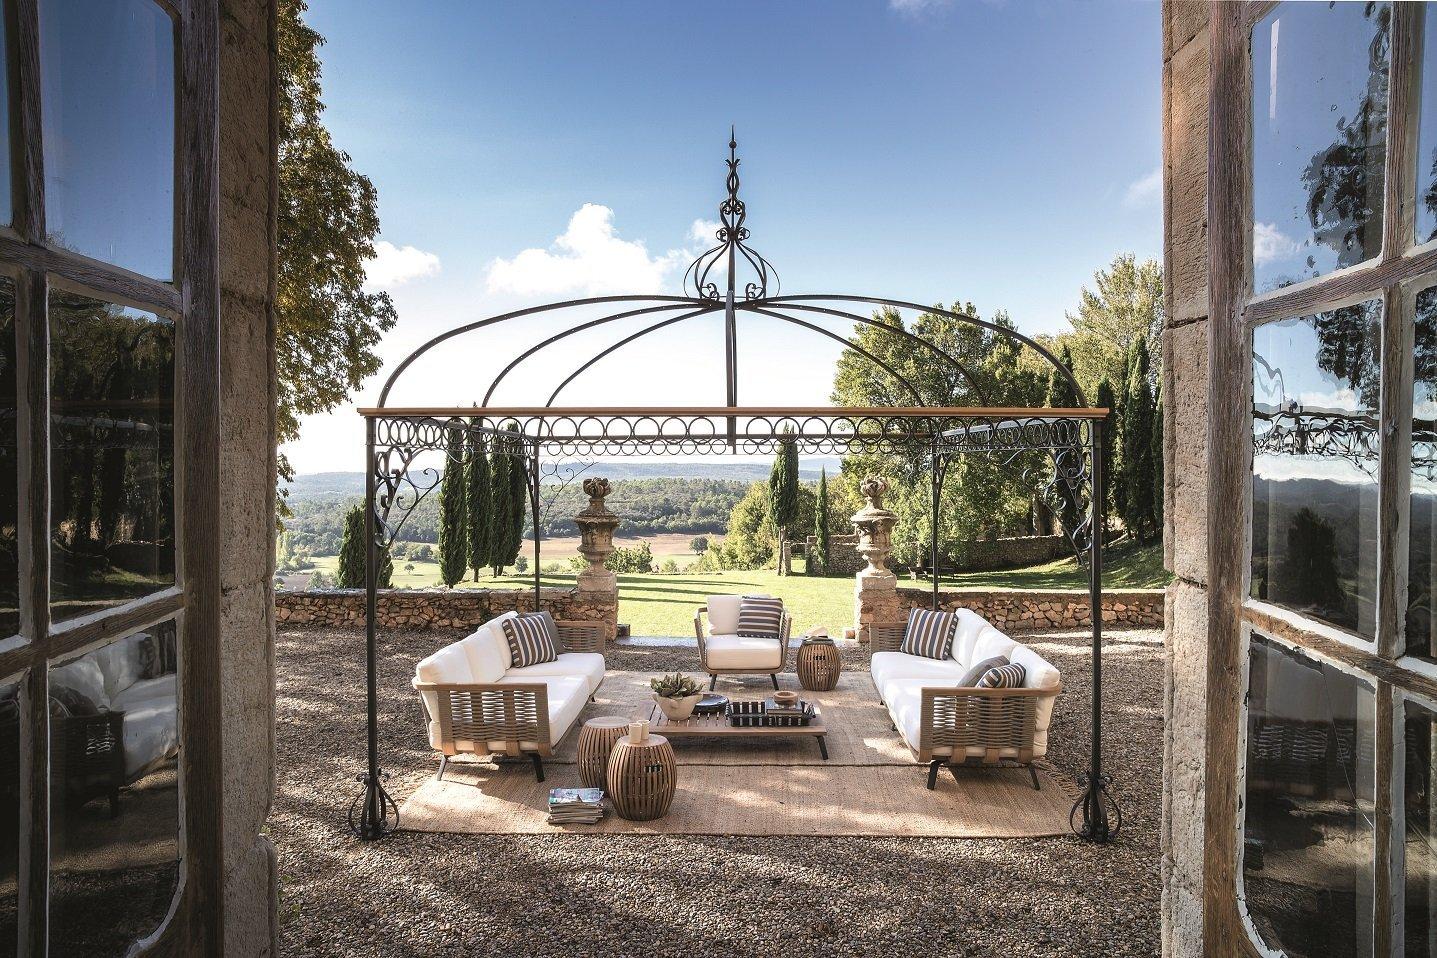 Gazebo giardino - Arredo Battipaglia, Mobili, Salerno